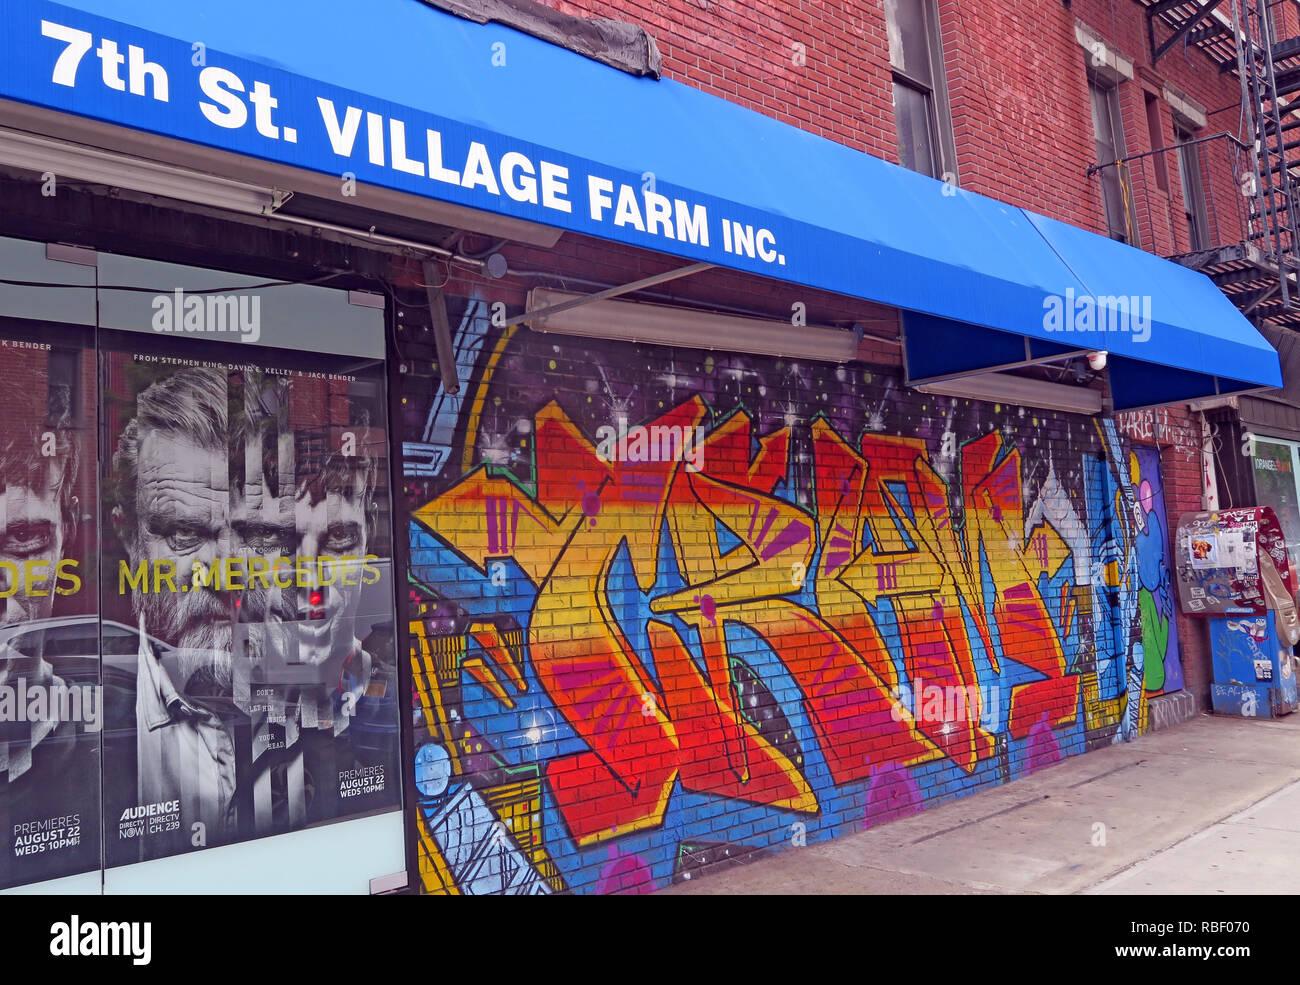 GoTonySmith,@HotpixUK,HotpixUK,NYC,St